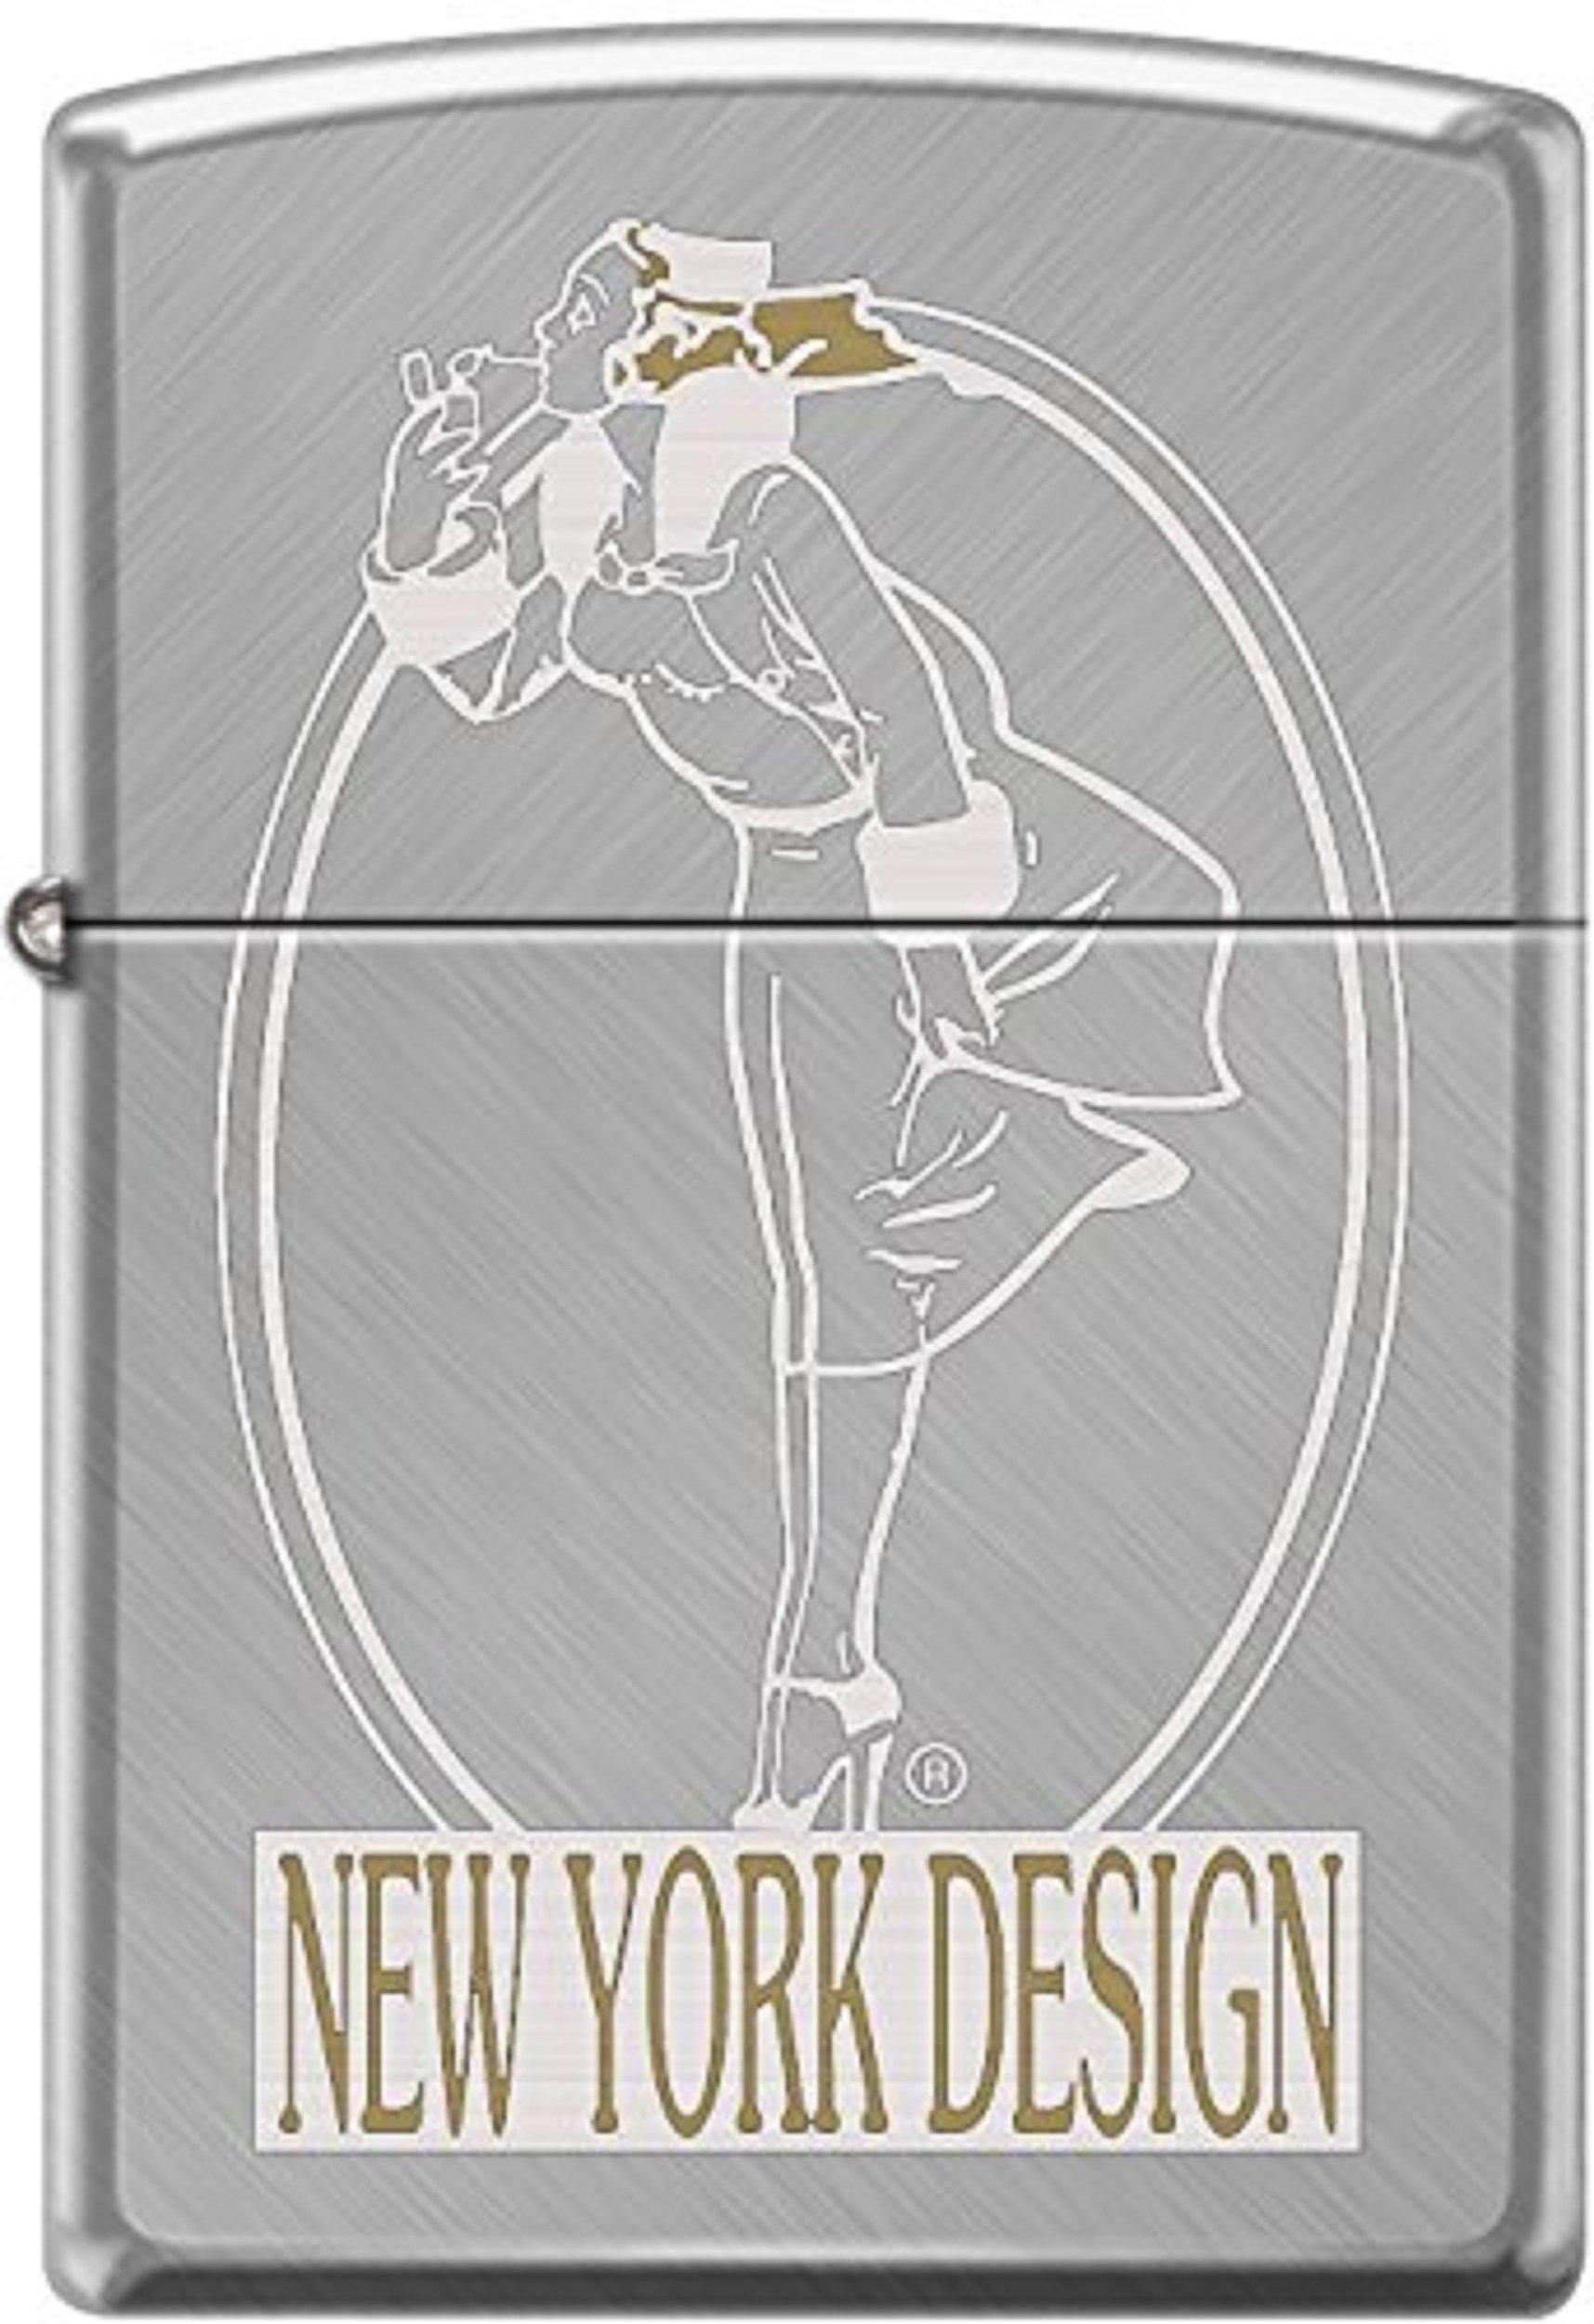 Zippo Windy Girl New York Design Herringbone Sweep WindProof Lighter New Rare